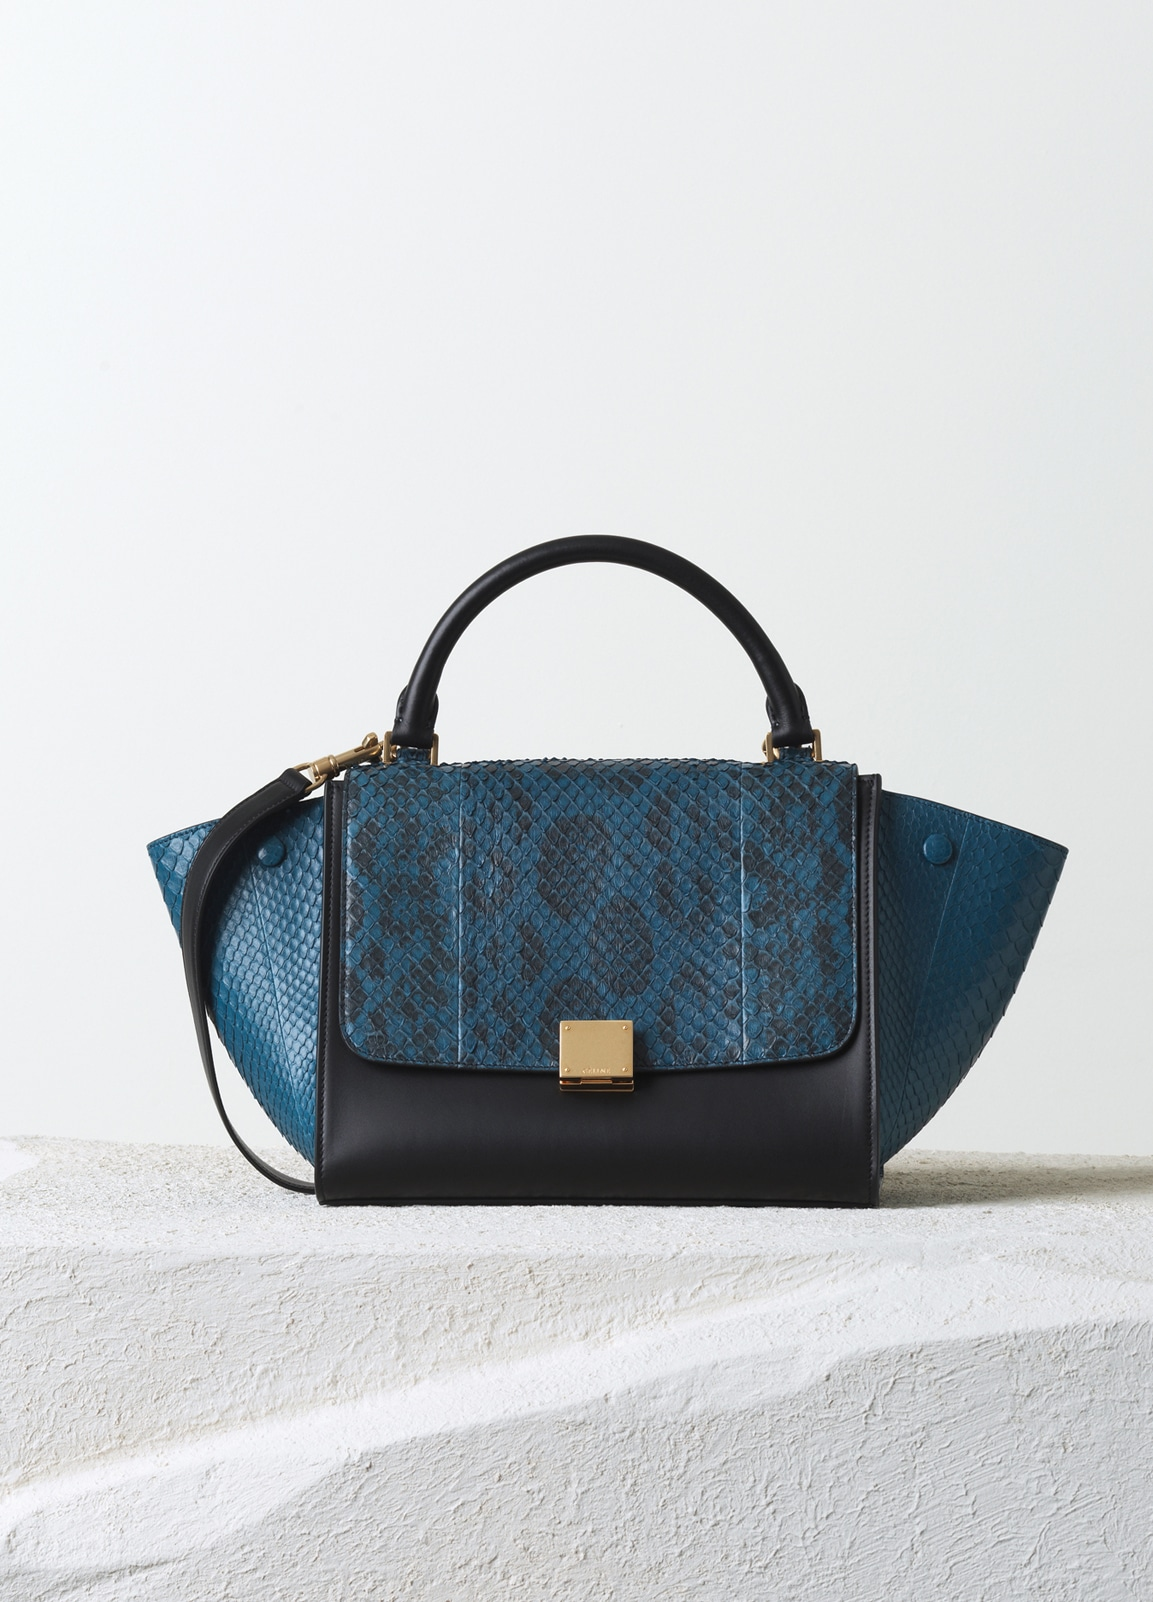 celine luggage tote where to buy - celine khaki cotton handbag